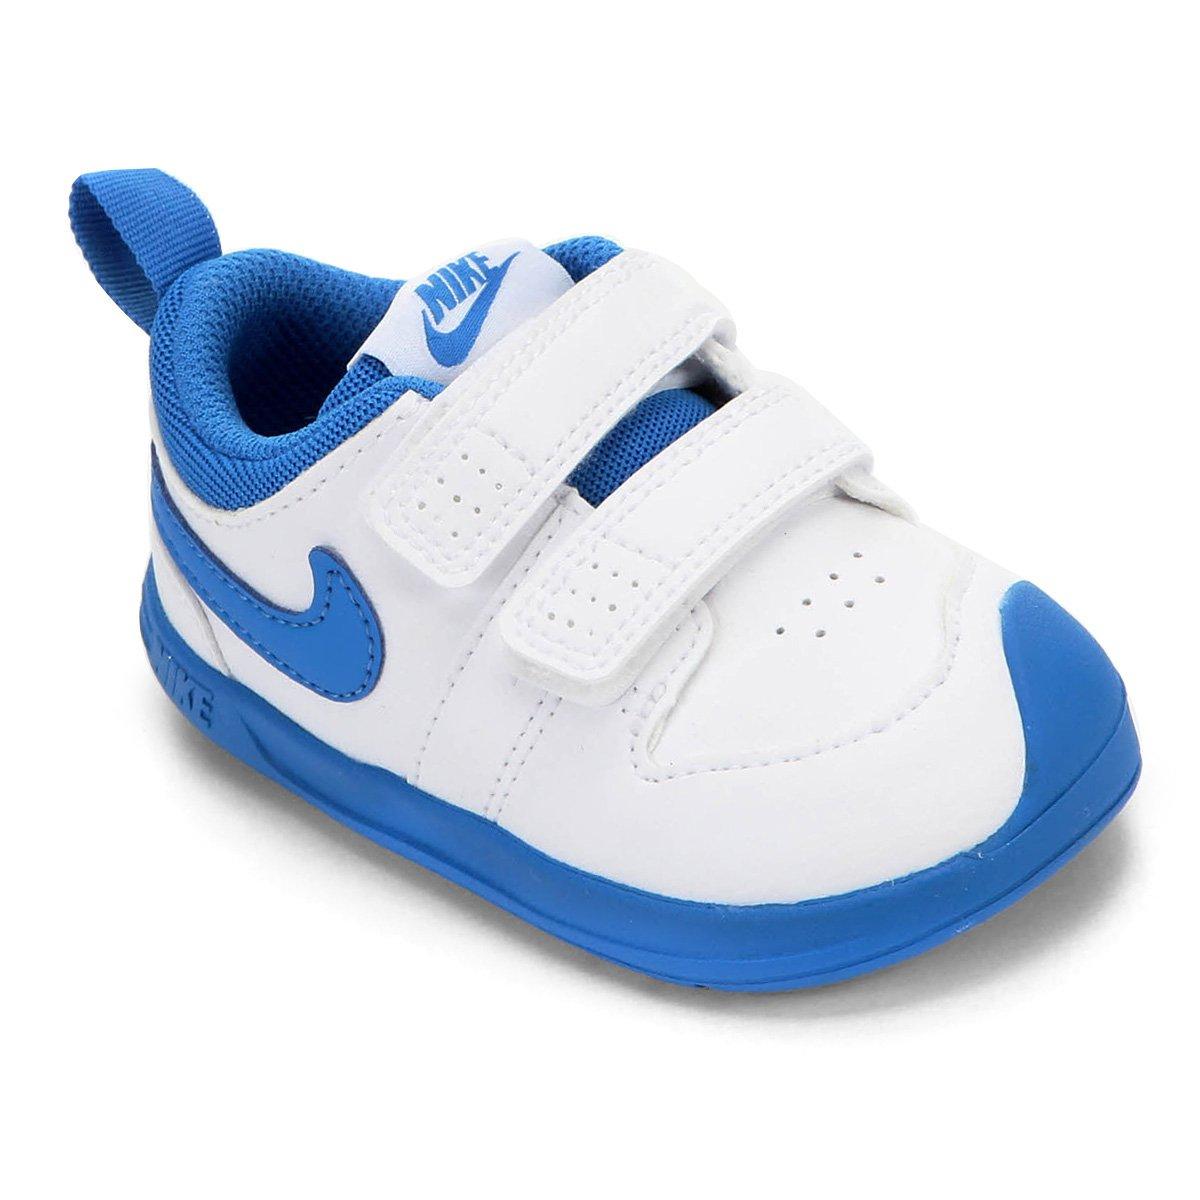 Murmullo caravana ignorancia  Tênis Infantil Nike Pico 5 - Branco e Azul | Netshoes